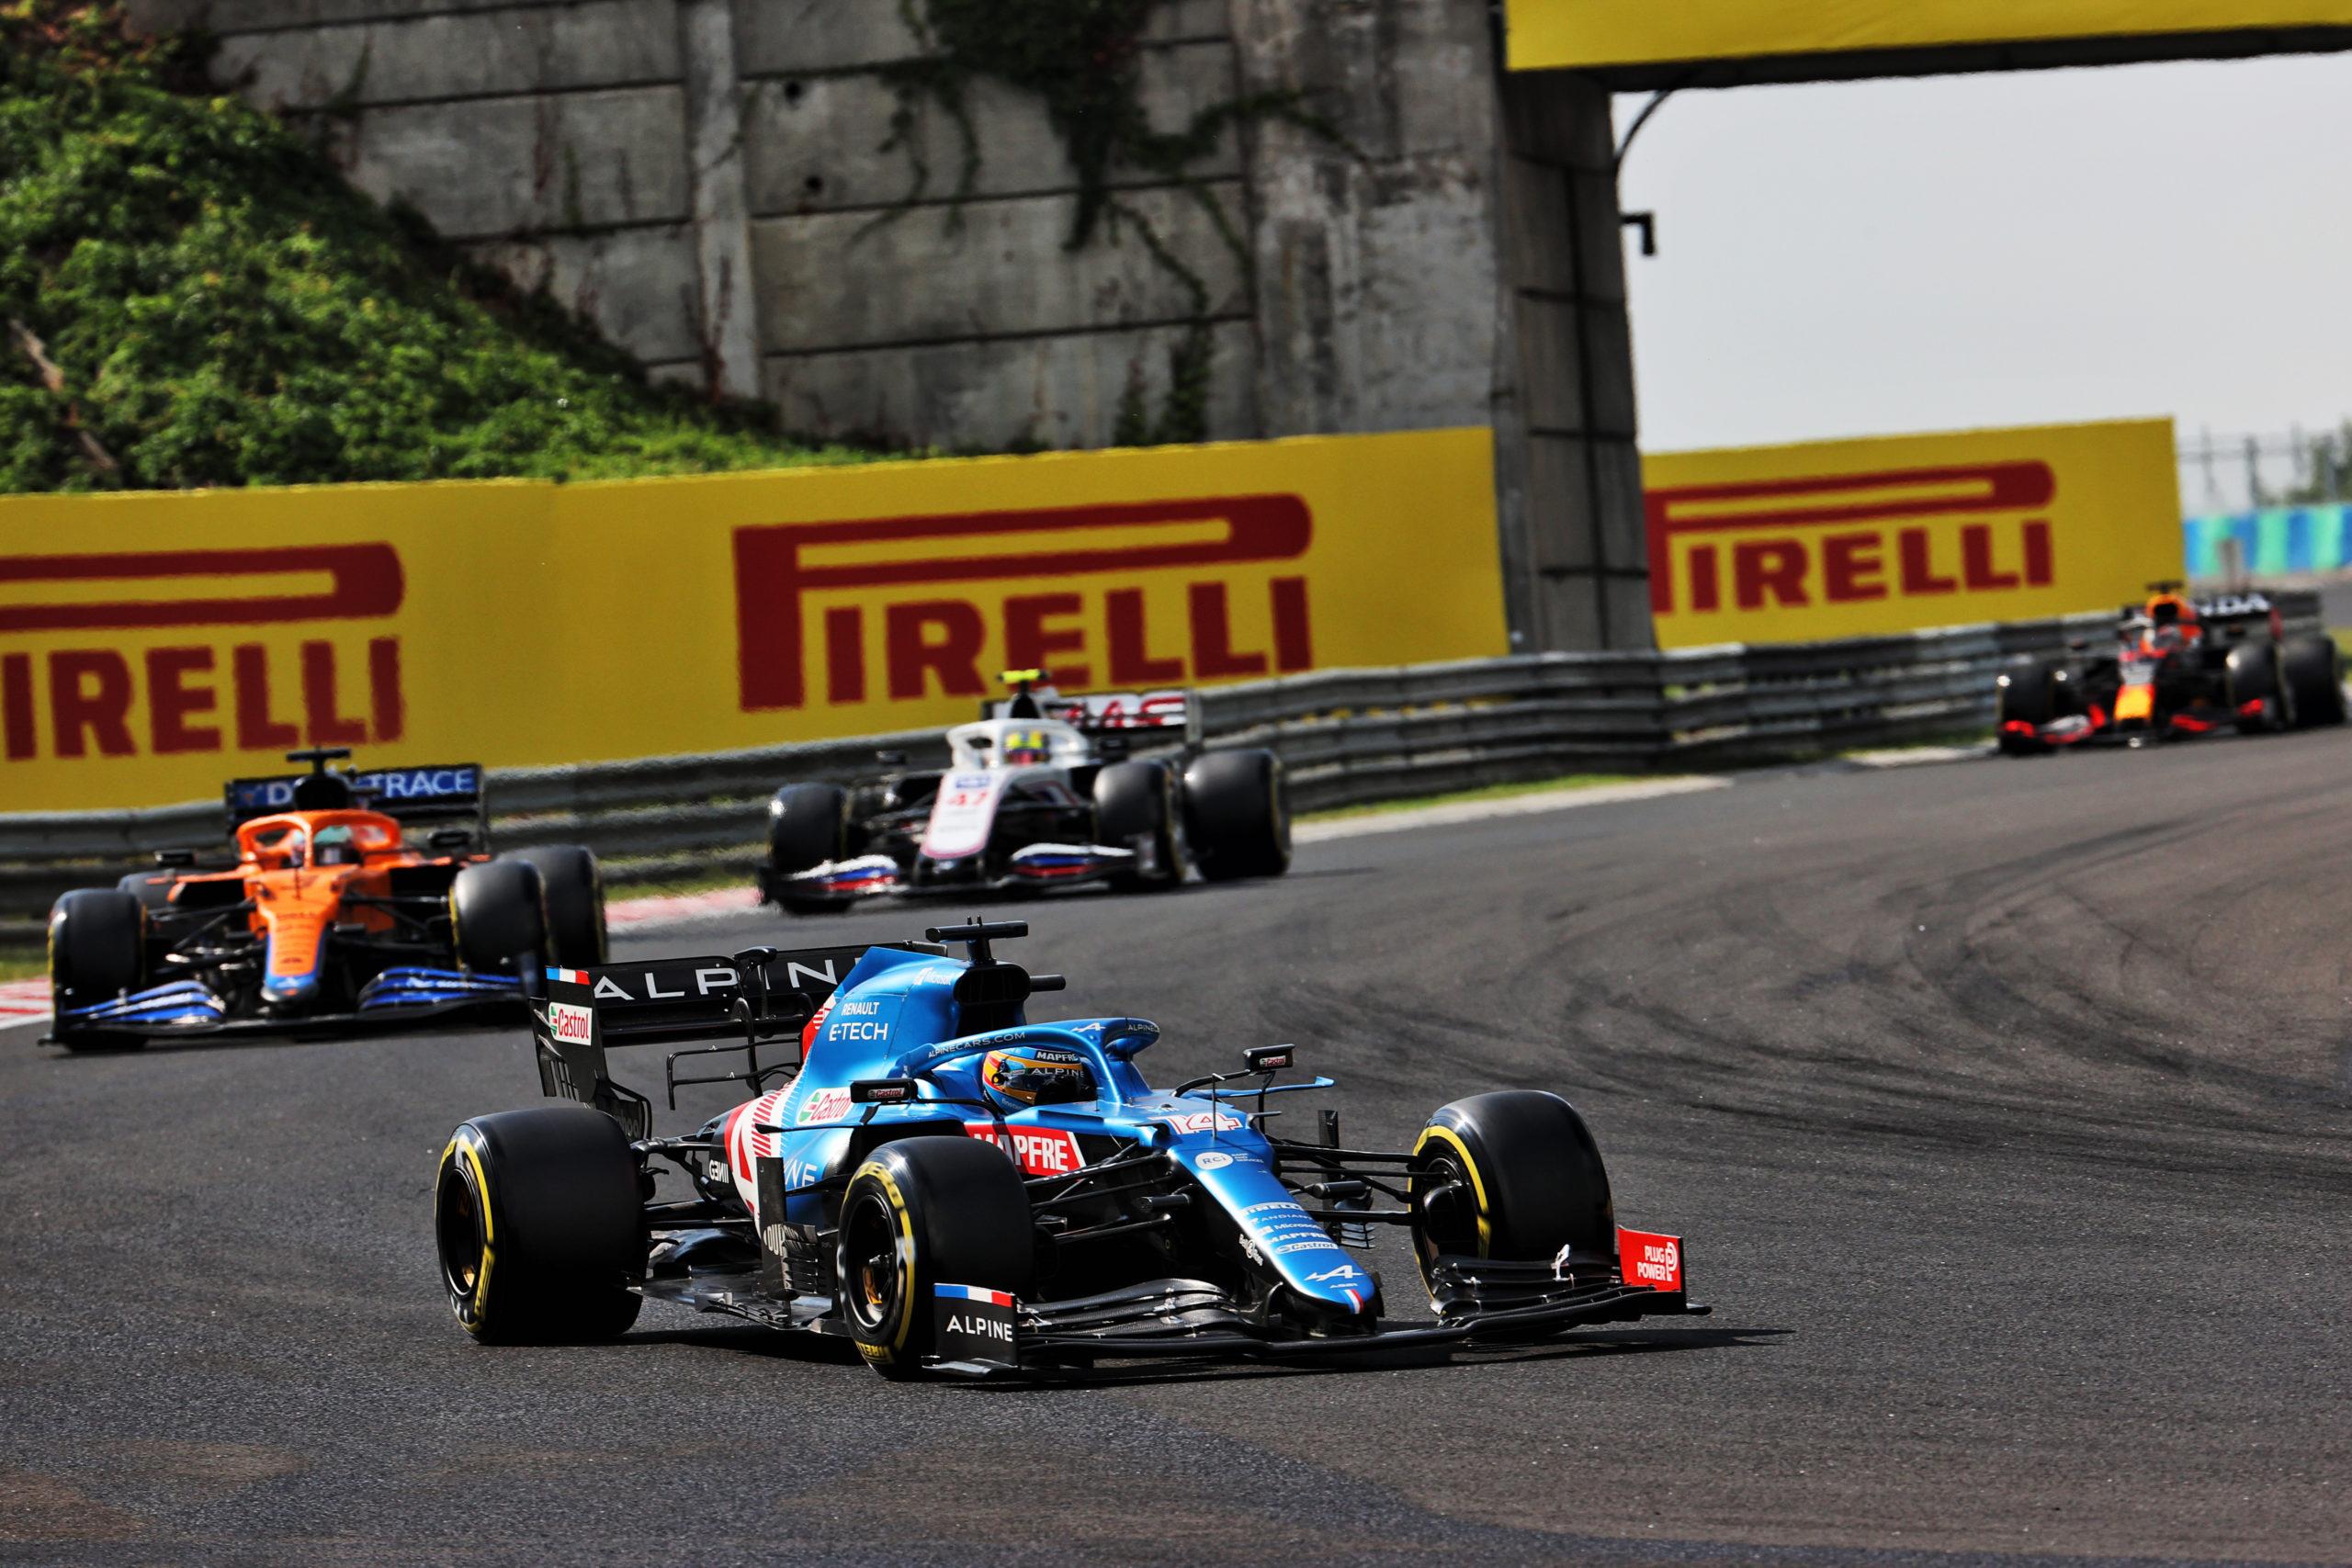 Fernando Alonso (ESP) , Alpine F1 Team A521, F1 Grand Prix of Hungary at Hungaroring on July 31, 2021